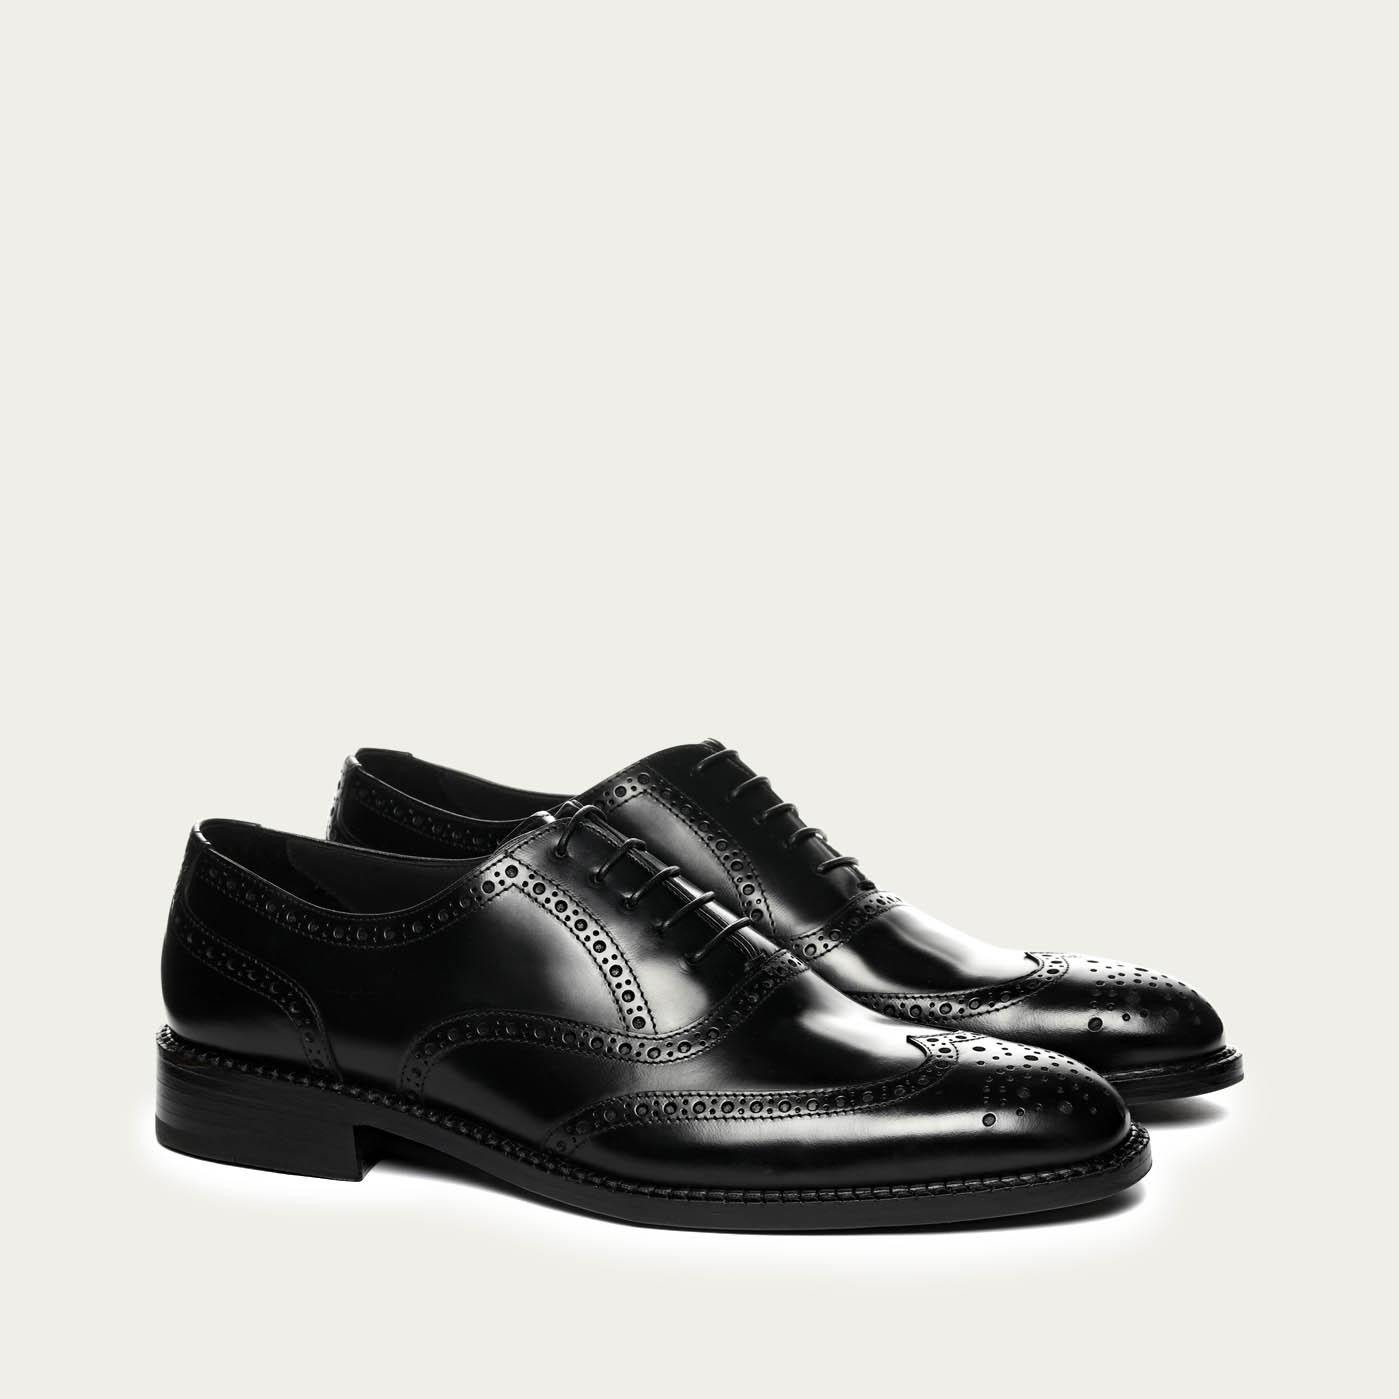 610f60adb87c2 Monterey Shoes | Black Mayfair Brogues | Bombinate